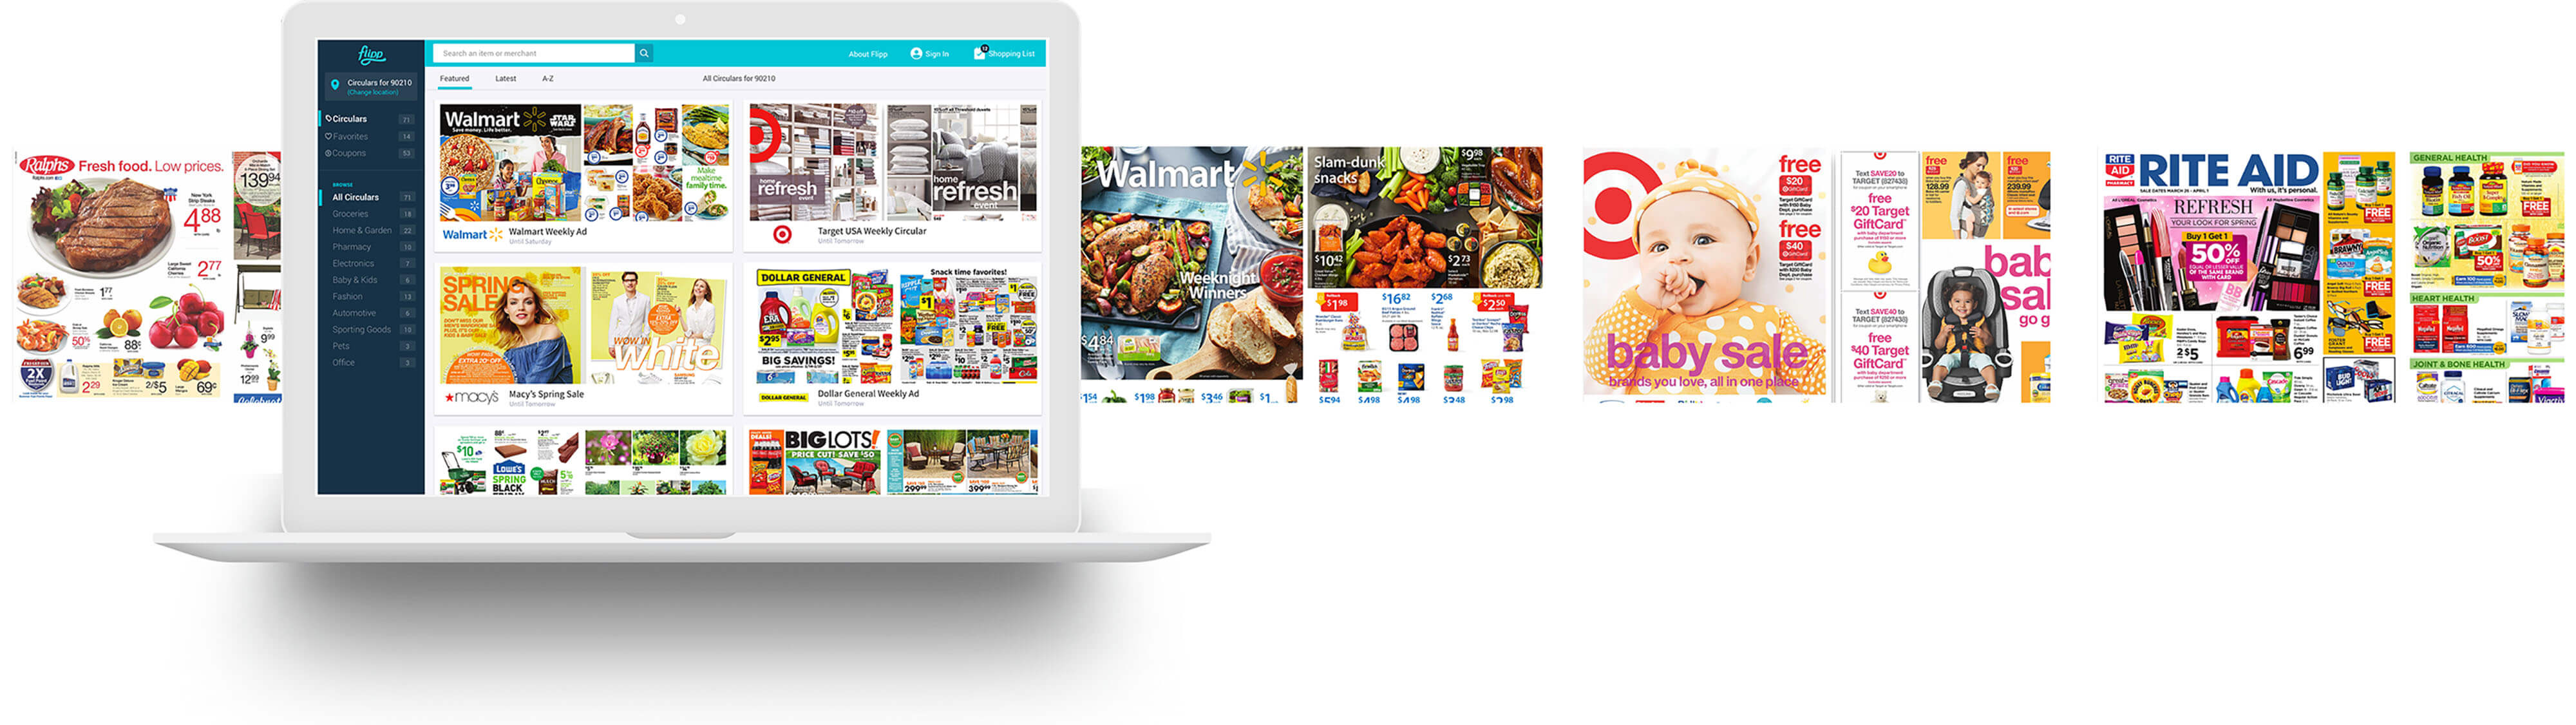 Weekly Ad Circulars, Deals & Online Coupons | Flipp